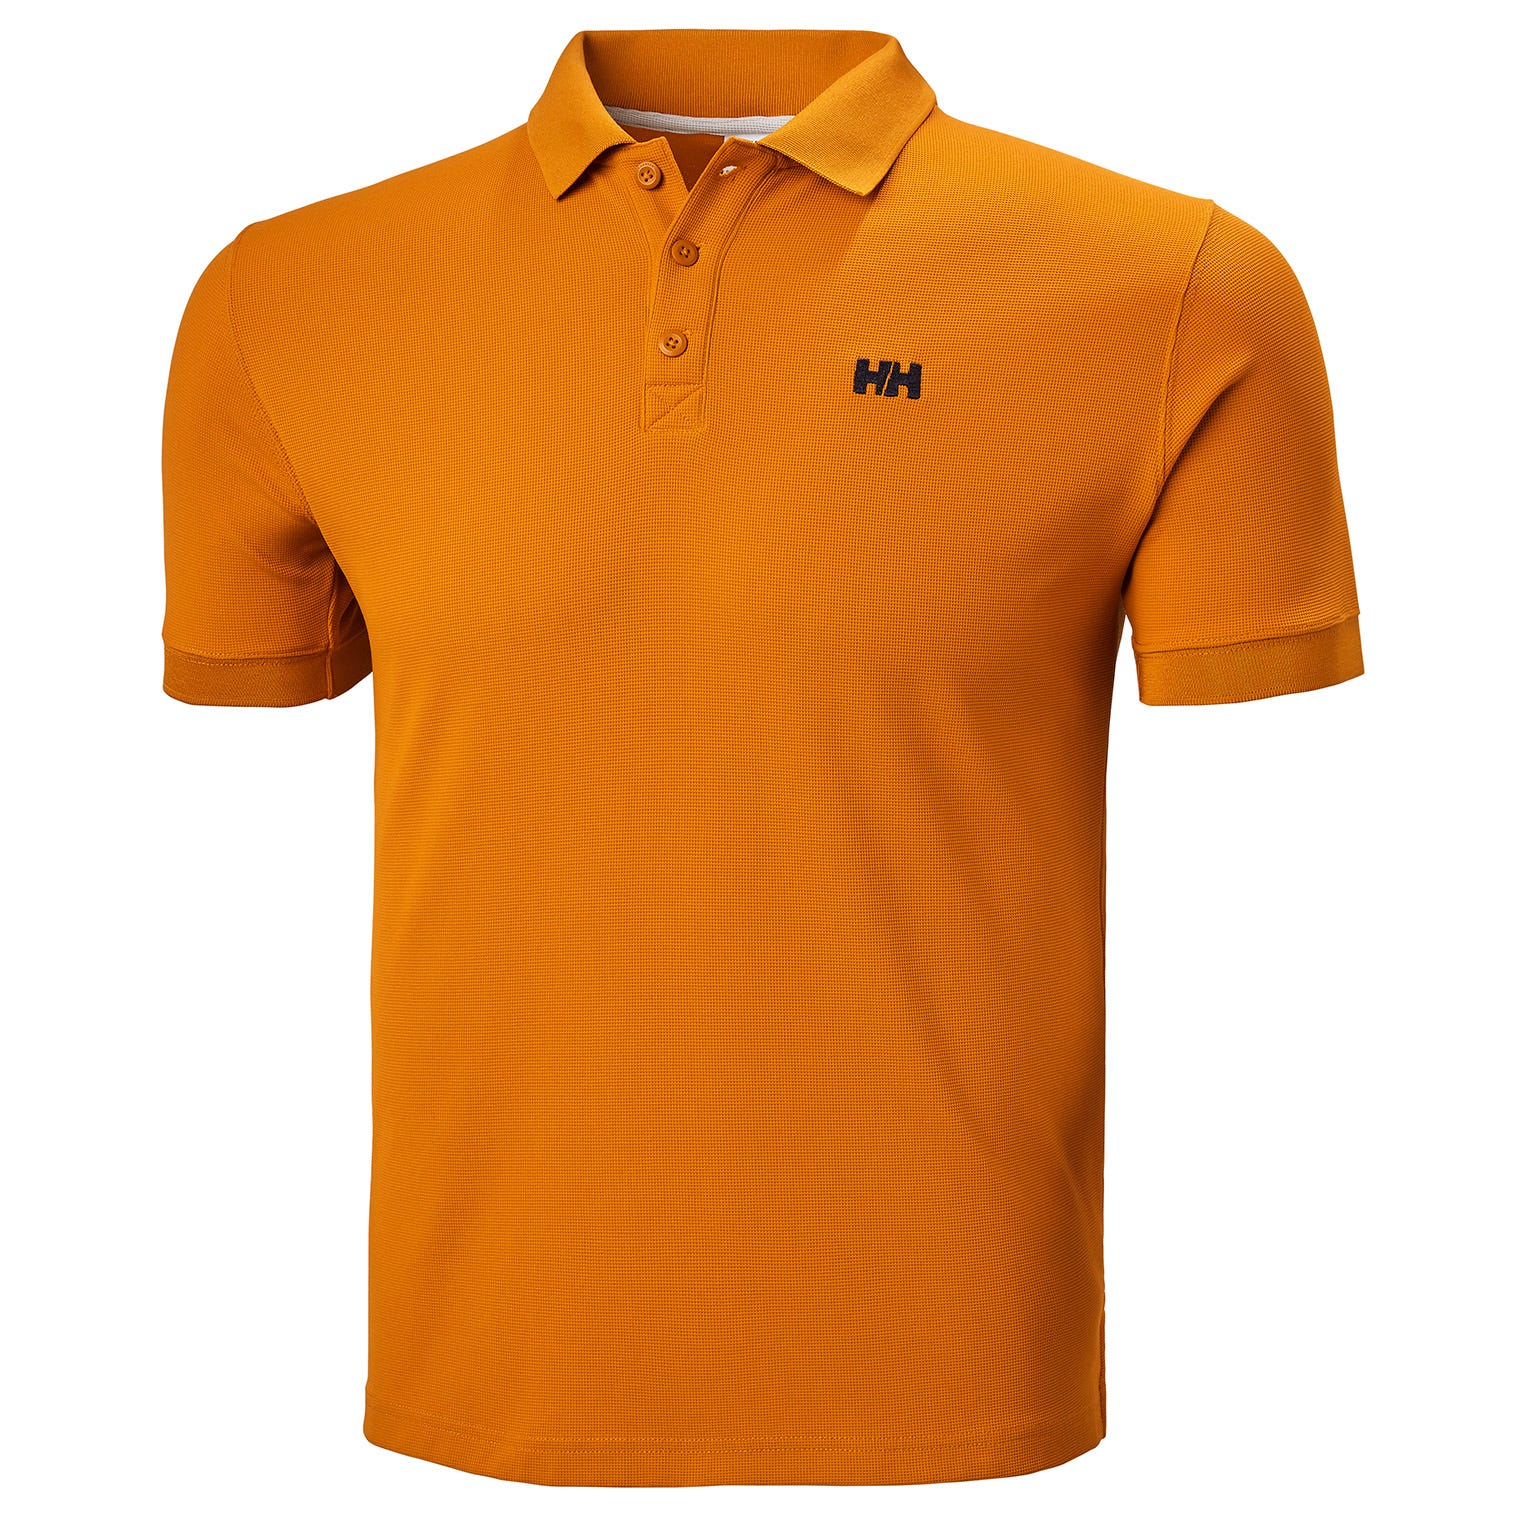 Driftline Polo | Performance Short Sleeve Shirt Gb Helly Hansen Mens Wicking Orange XXL